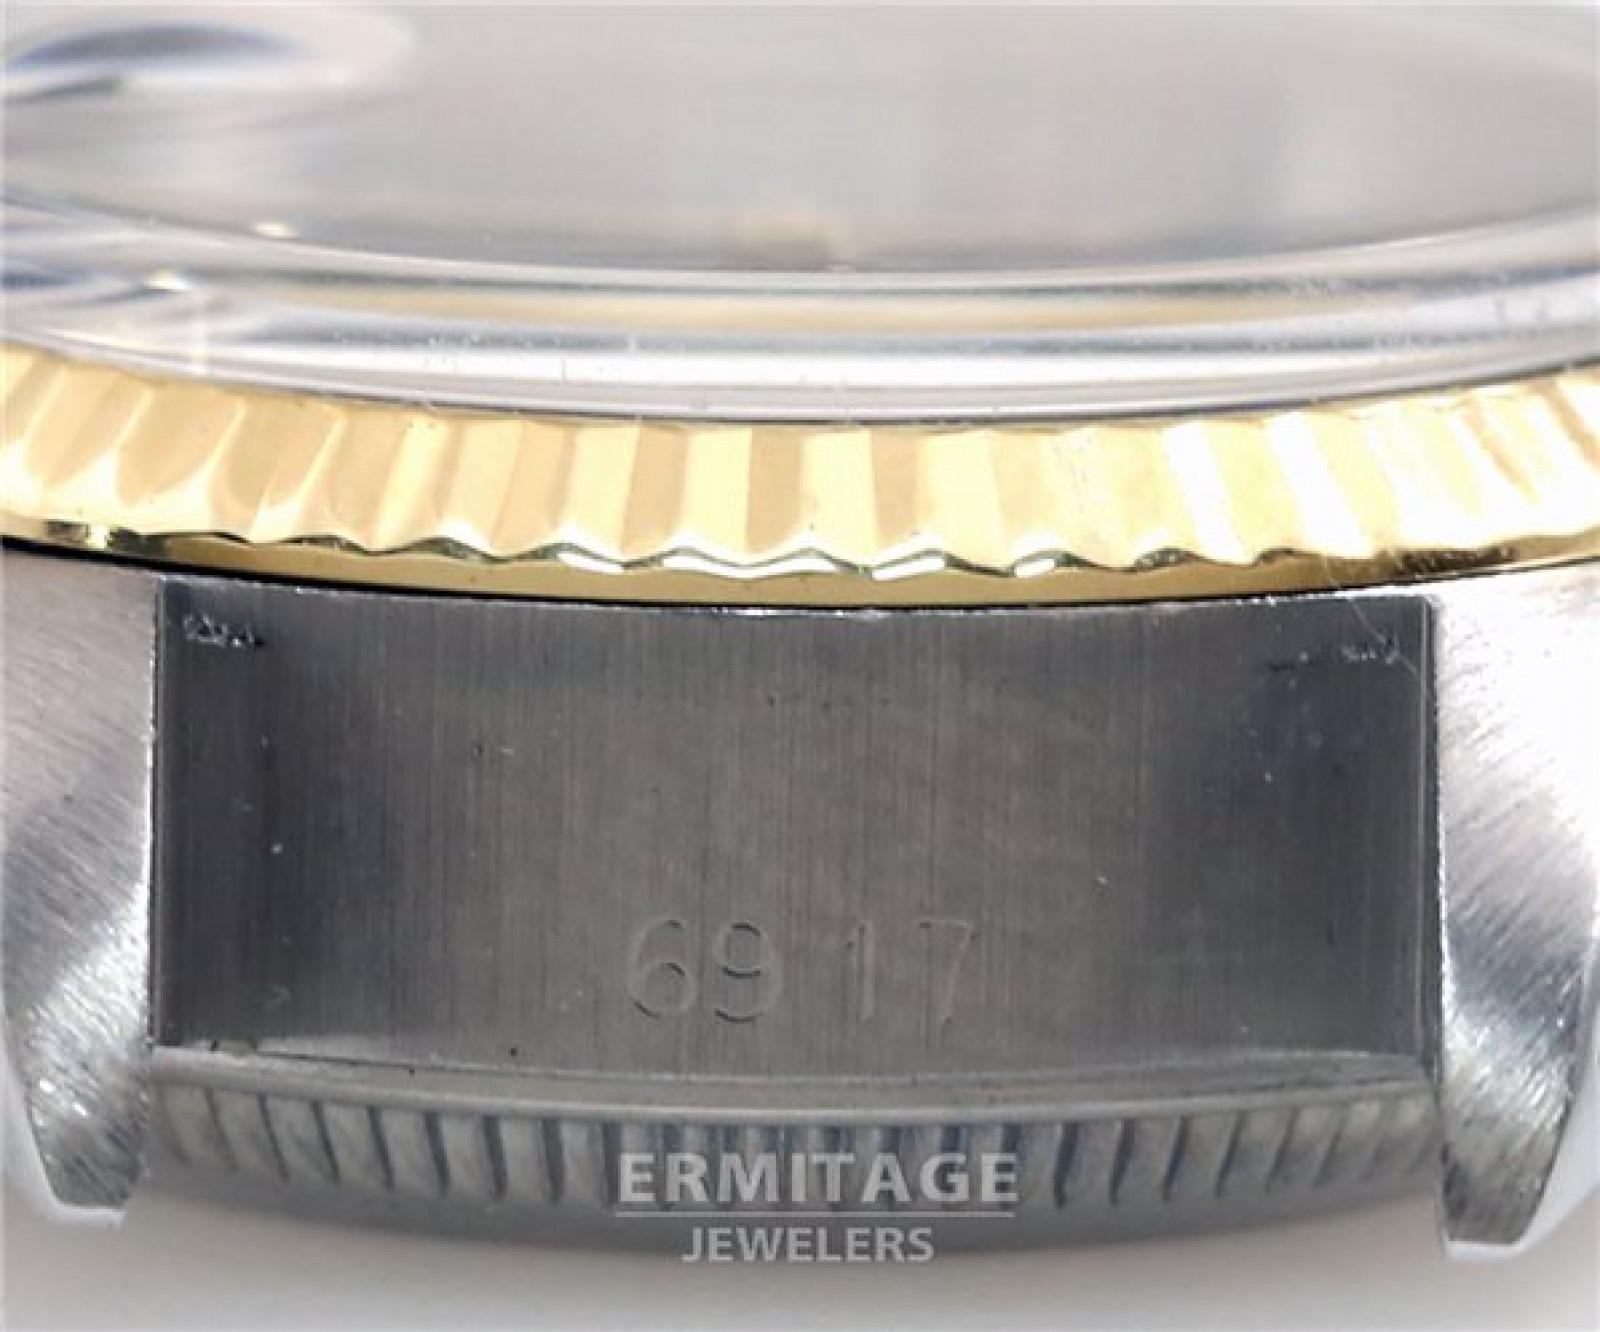 Vintage Mint Rolex Datejust Ref 6917